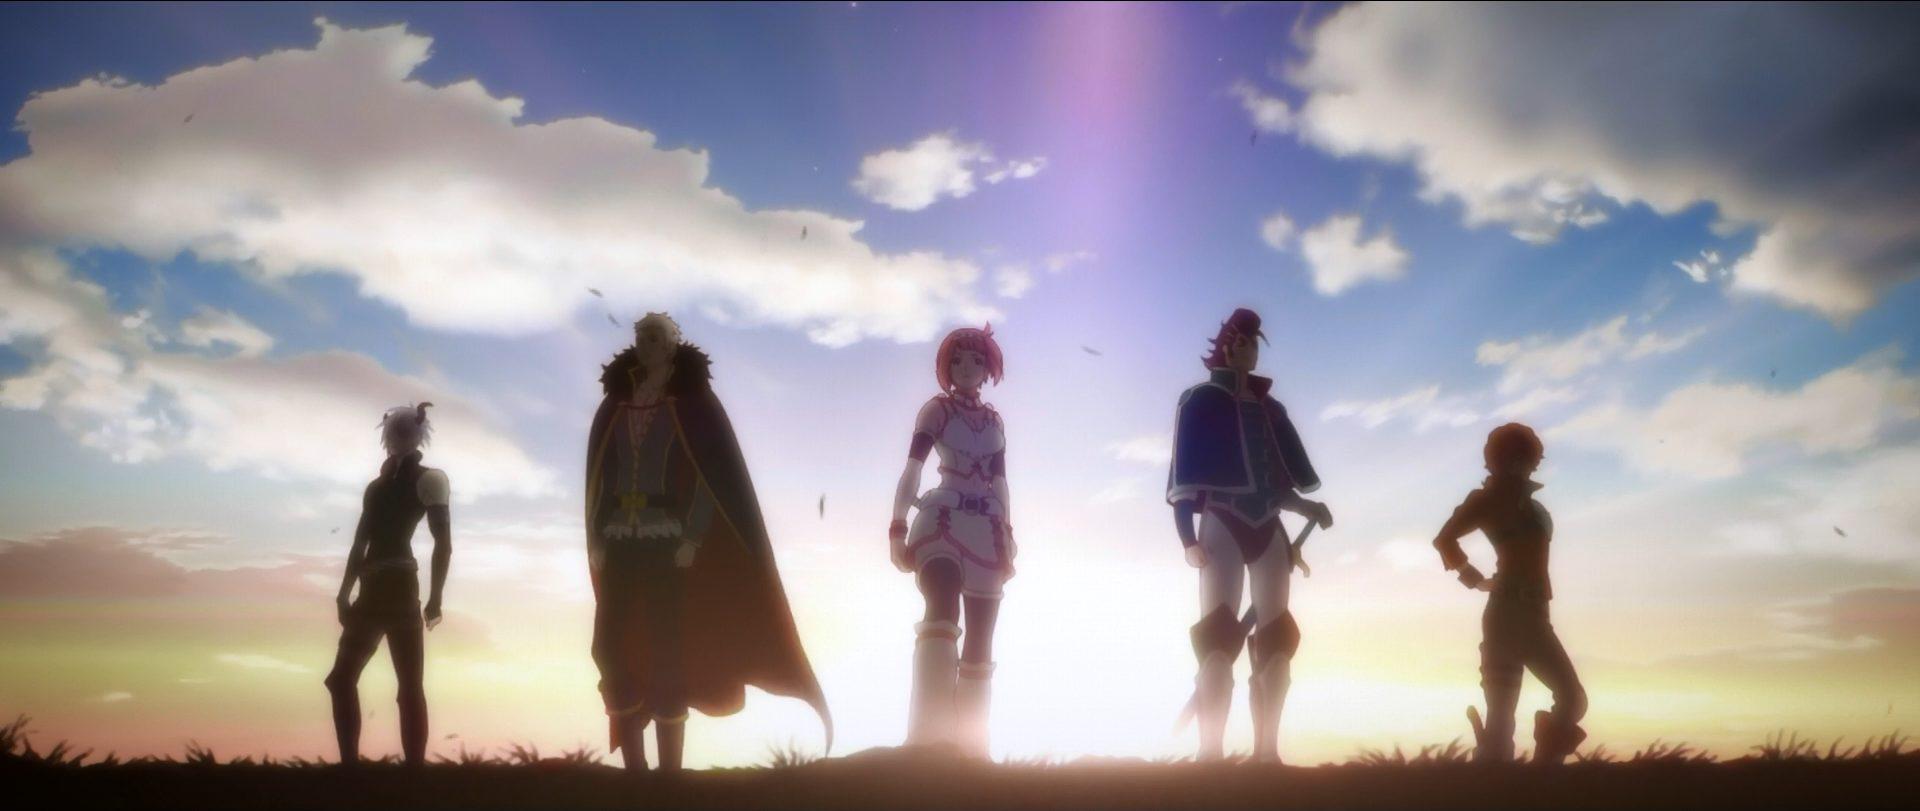 Header Image - Welcome to Westcountry Anime!